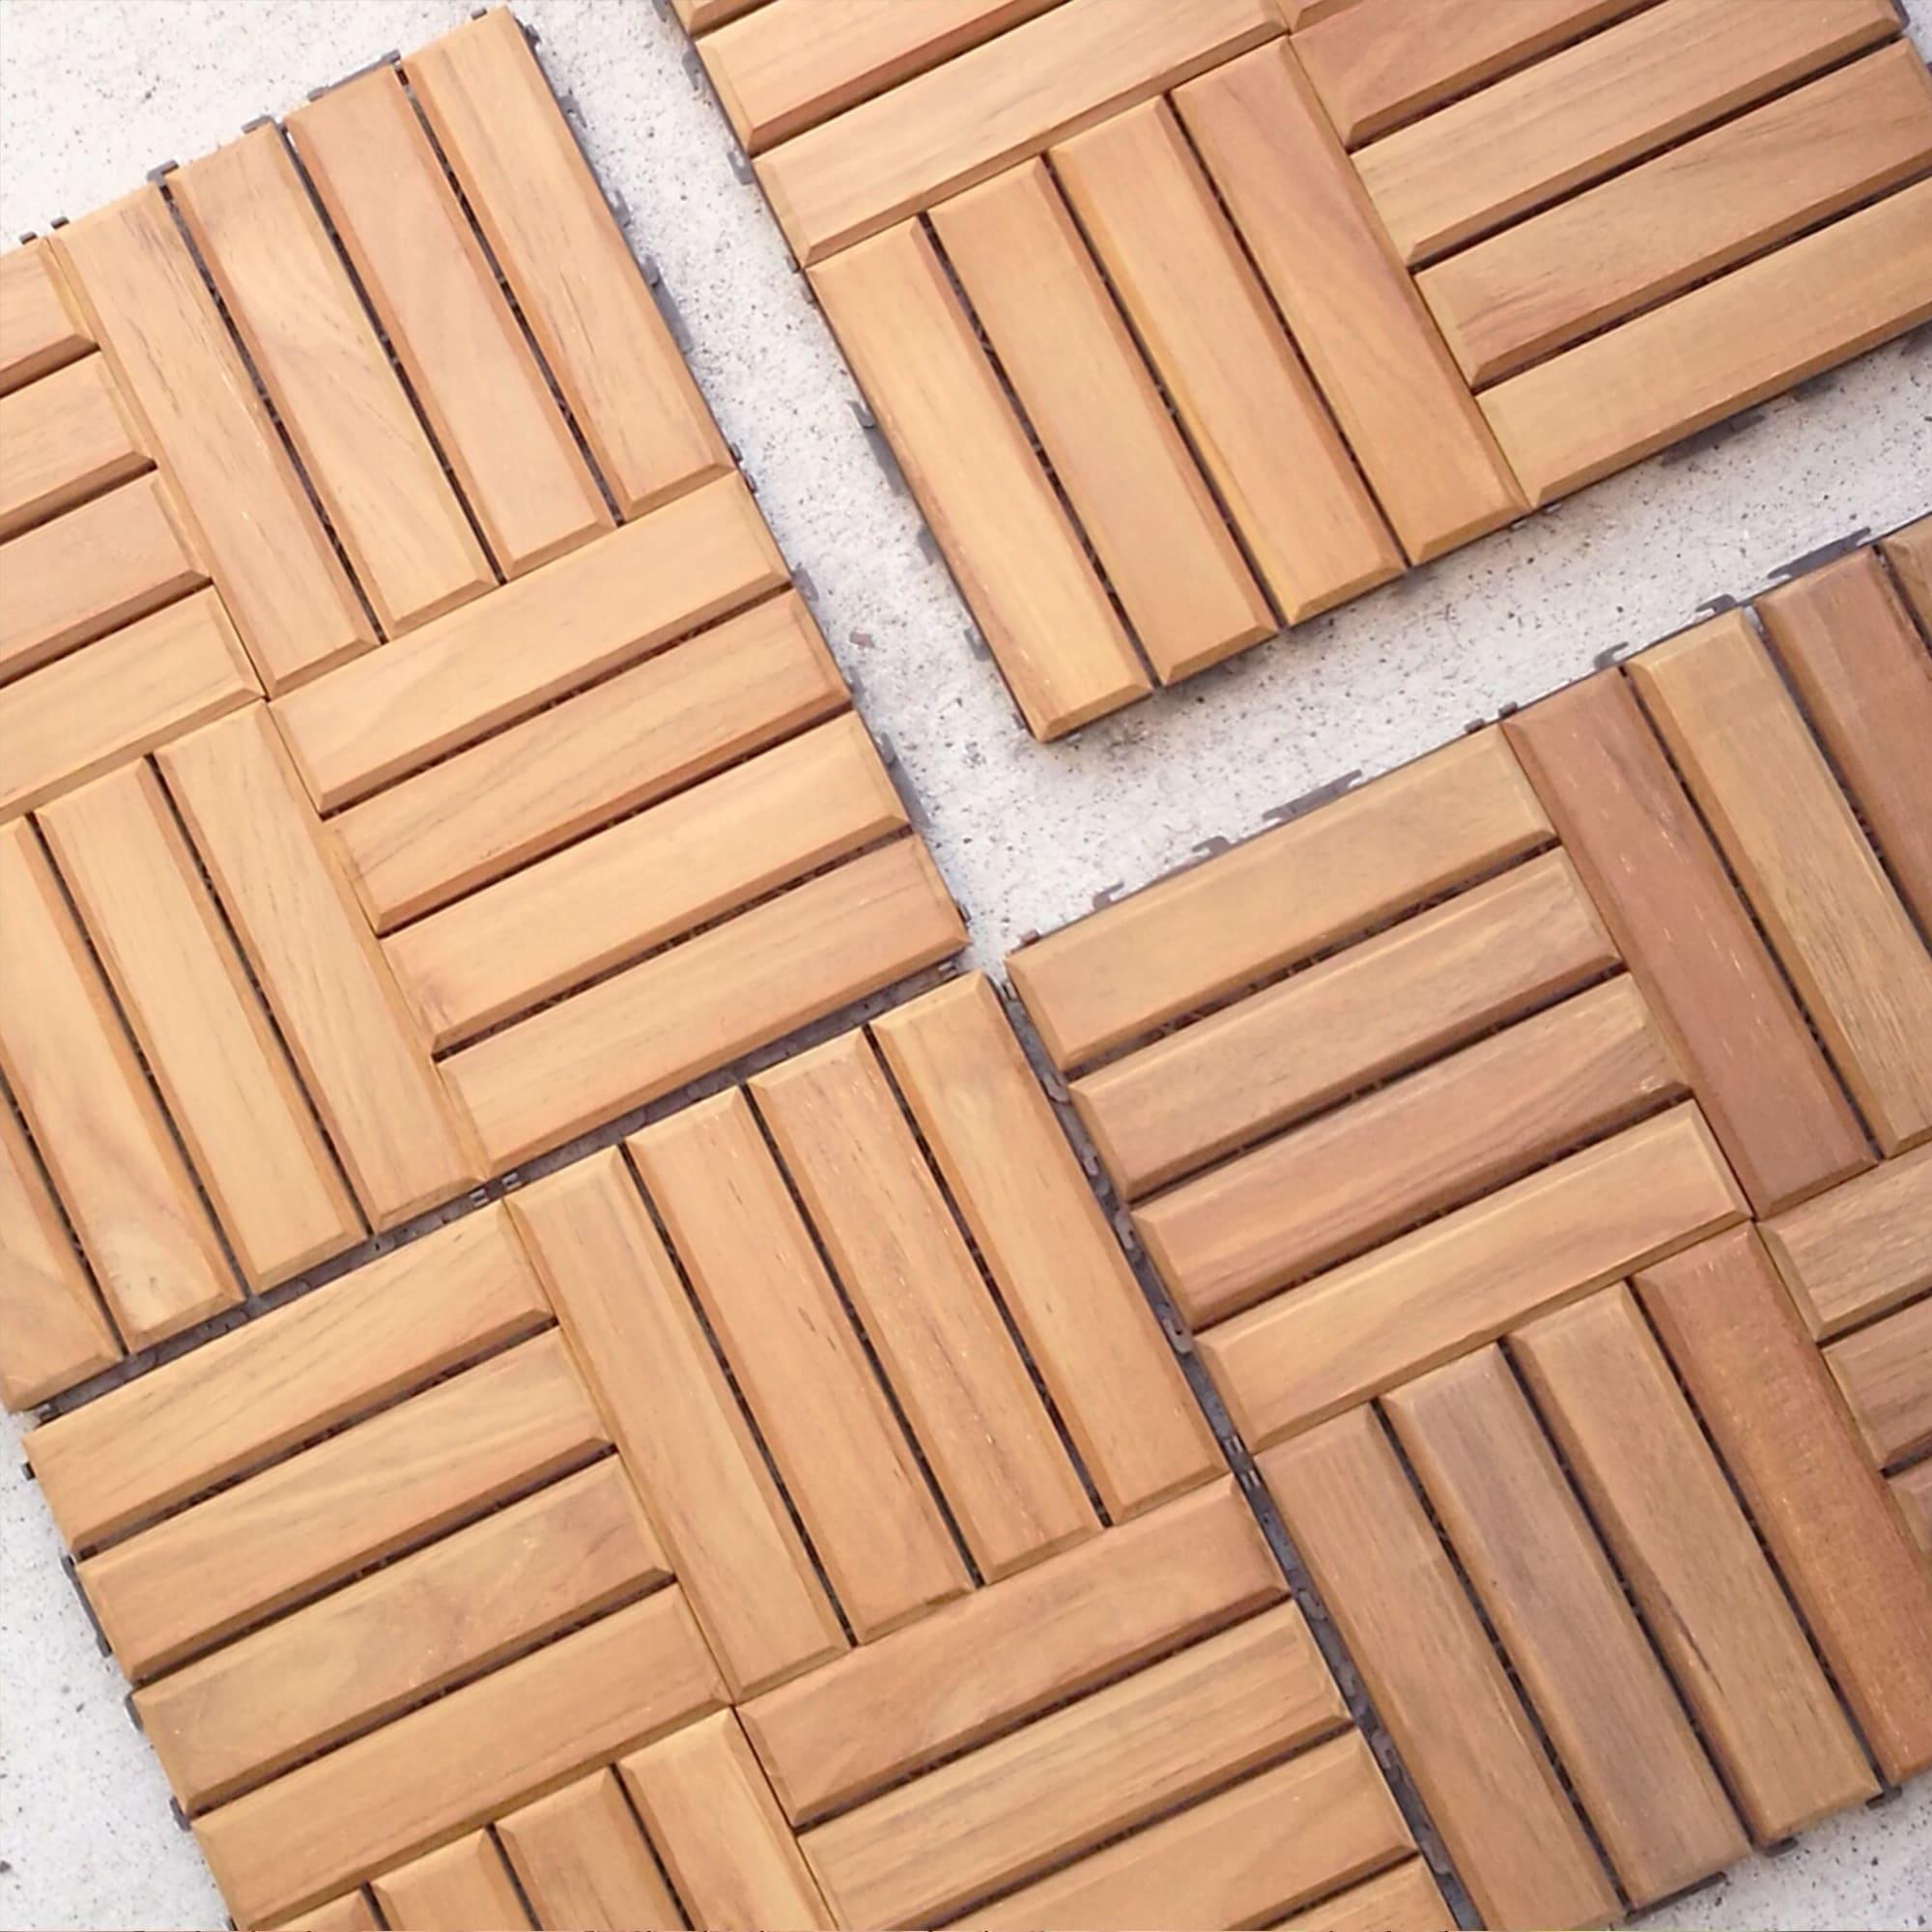 Cambridge Casual Teak Wood Interlocking Deck Tile Set (Pack of 10) (Brown - Teak)